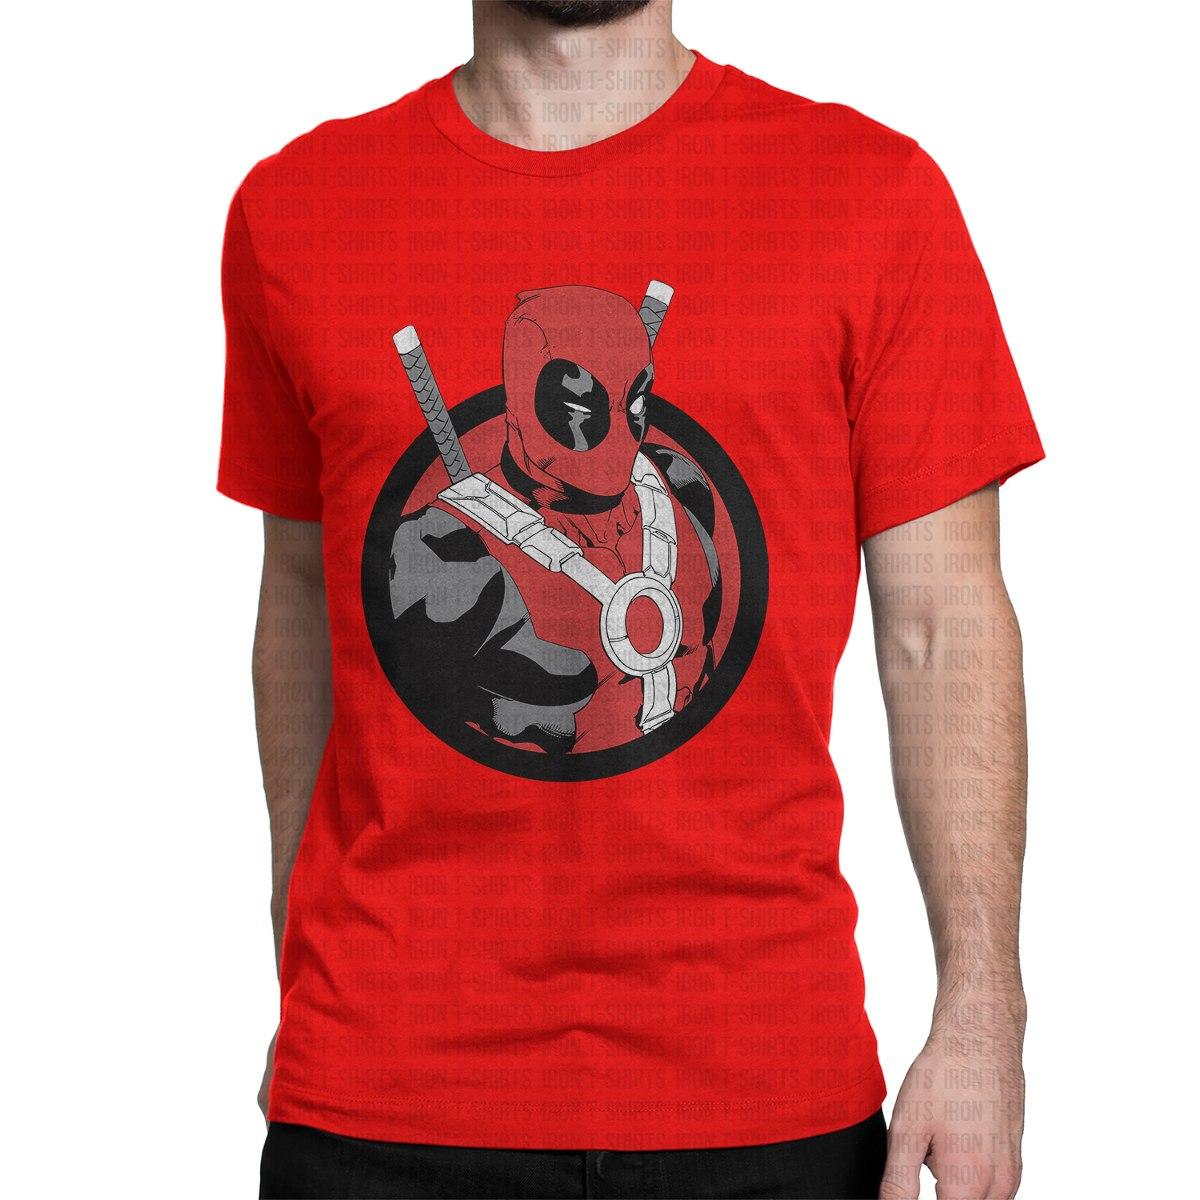 64879c4edacb3 Camiseta Deadpool Wade Winston Super Herói Camisa Geek Nerd - R  39 ...